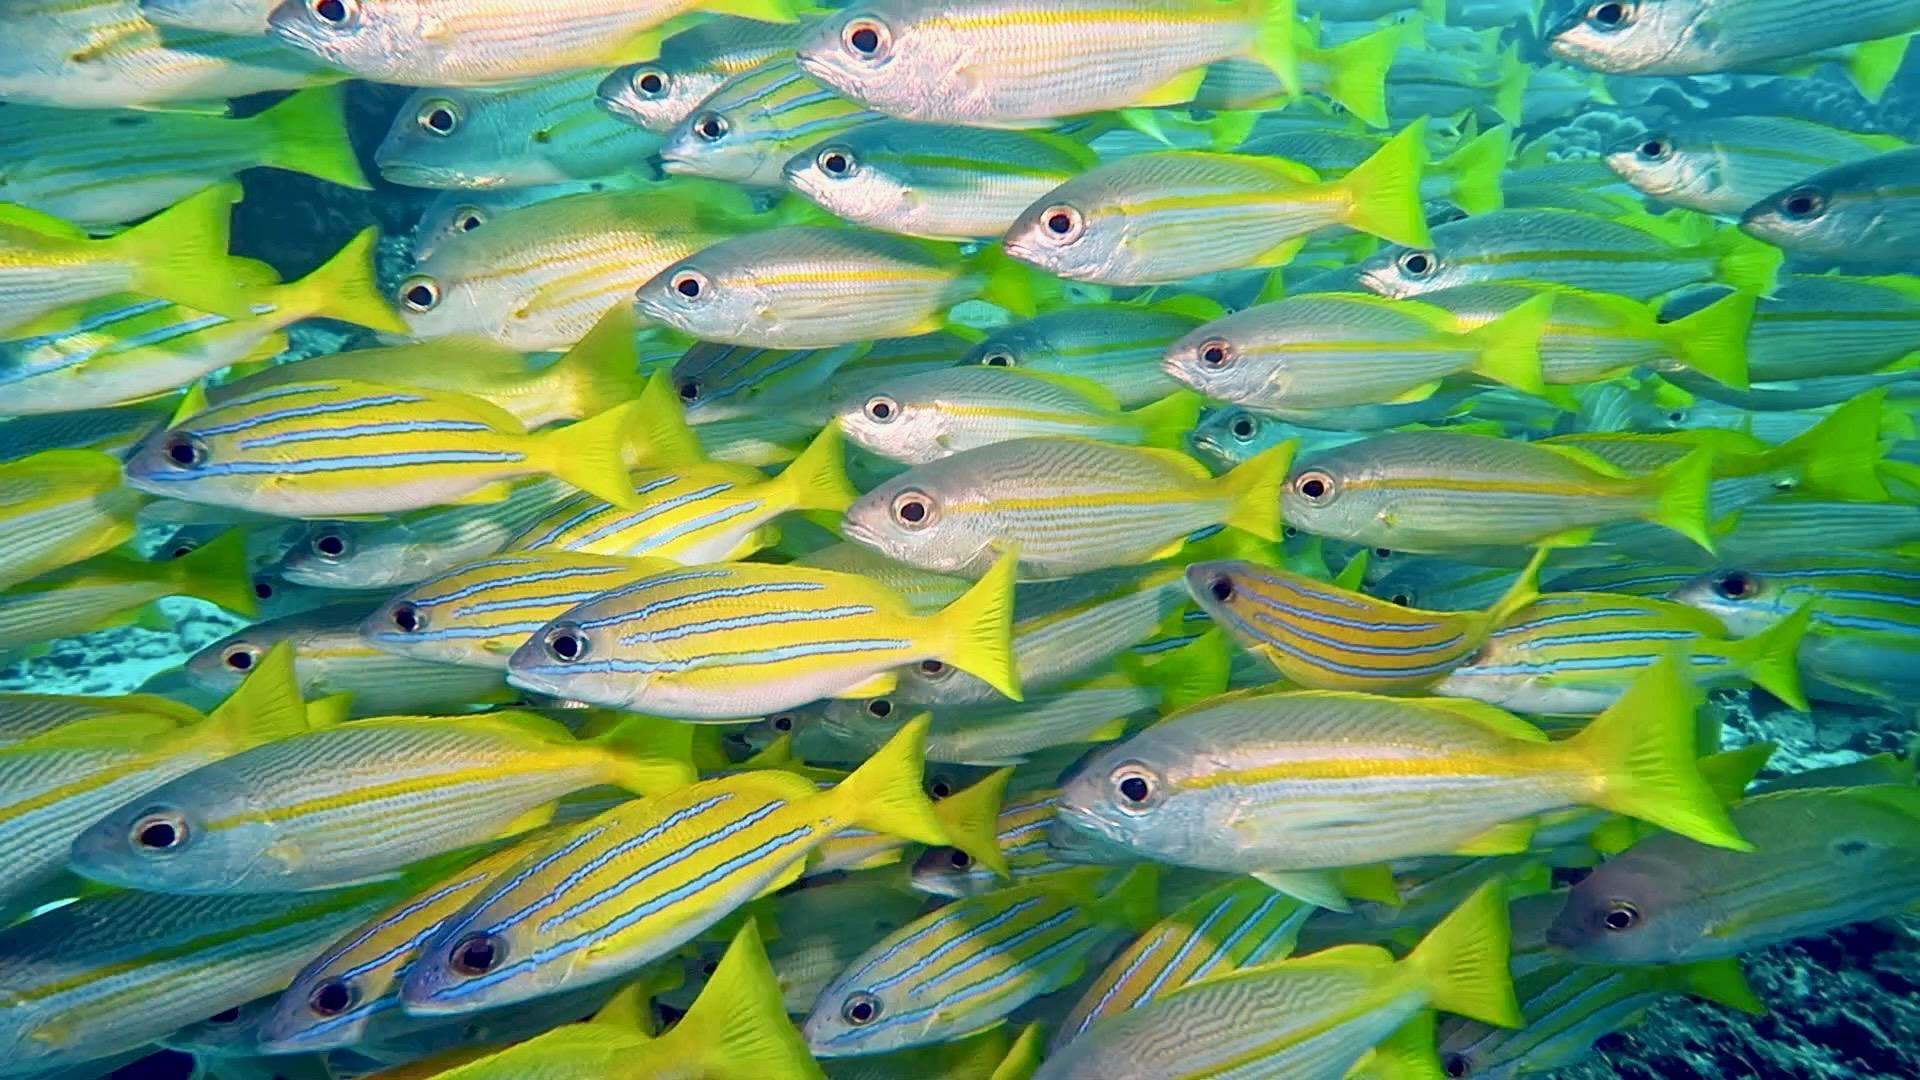 yellow-blue-silver fin fish 2.jpg